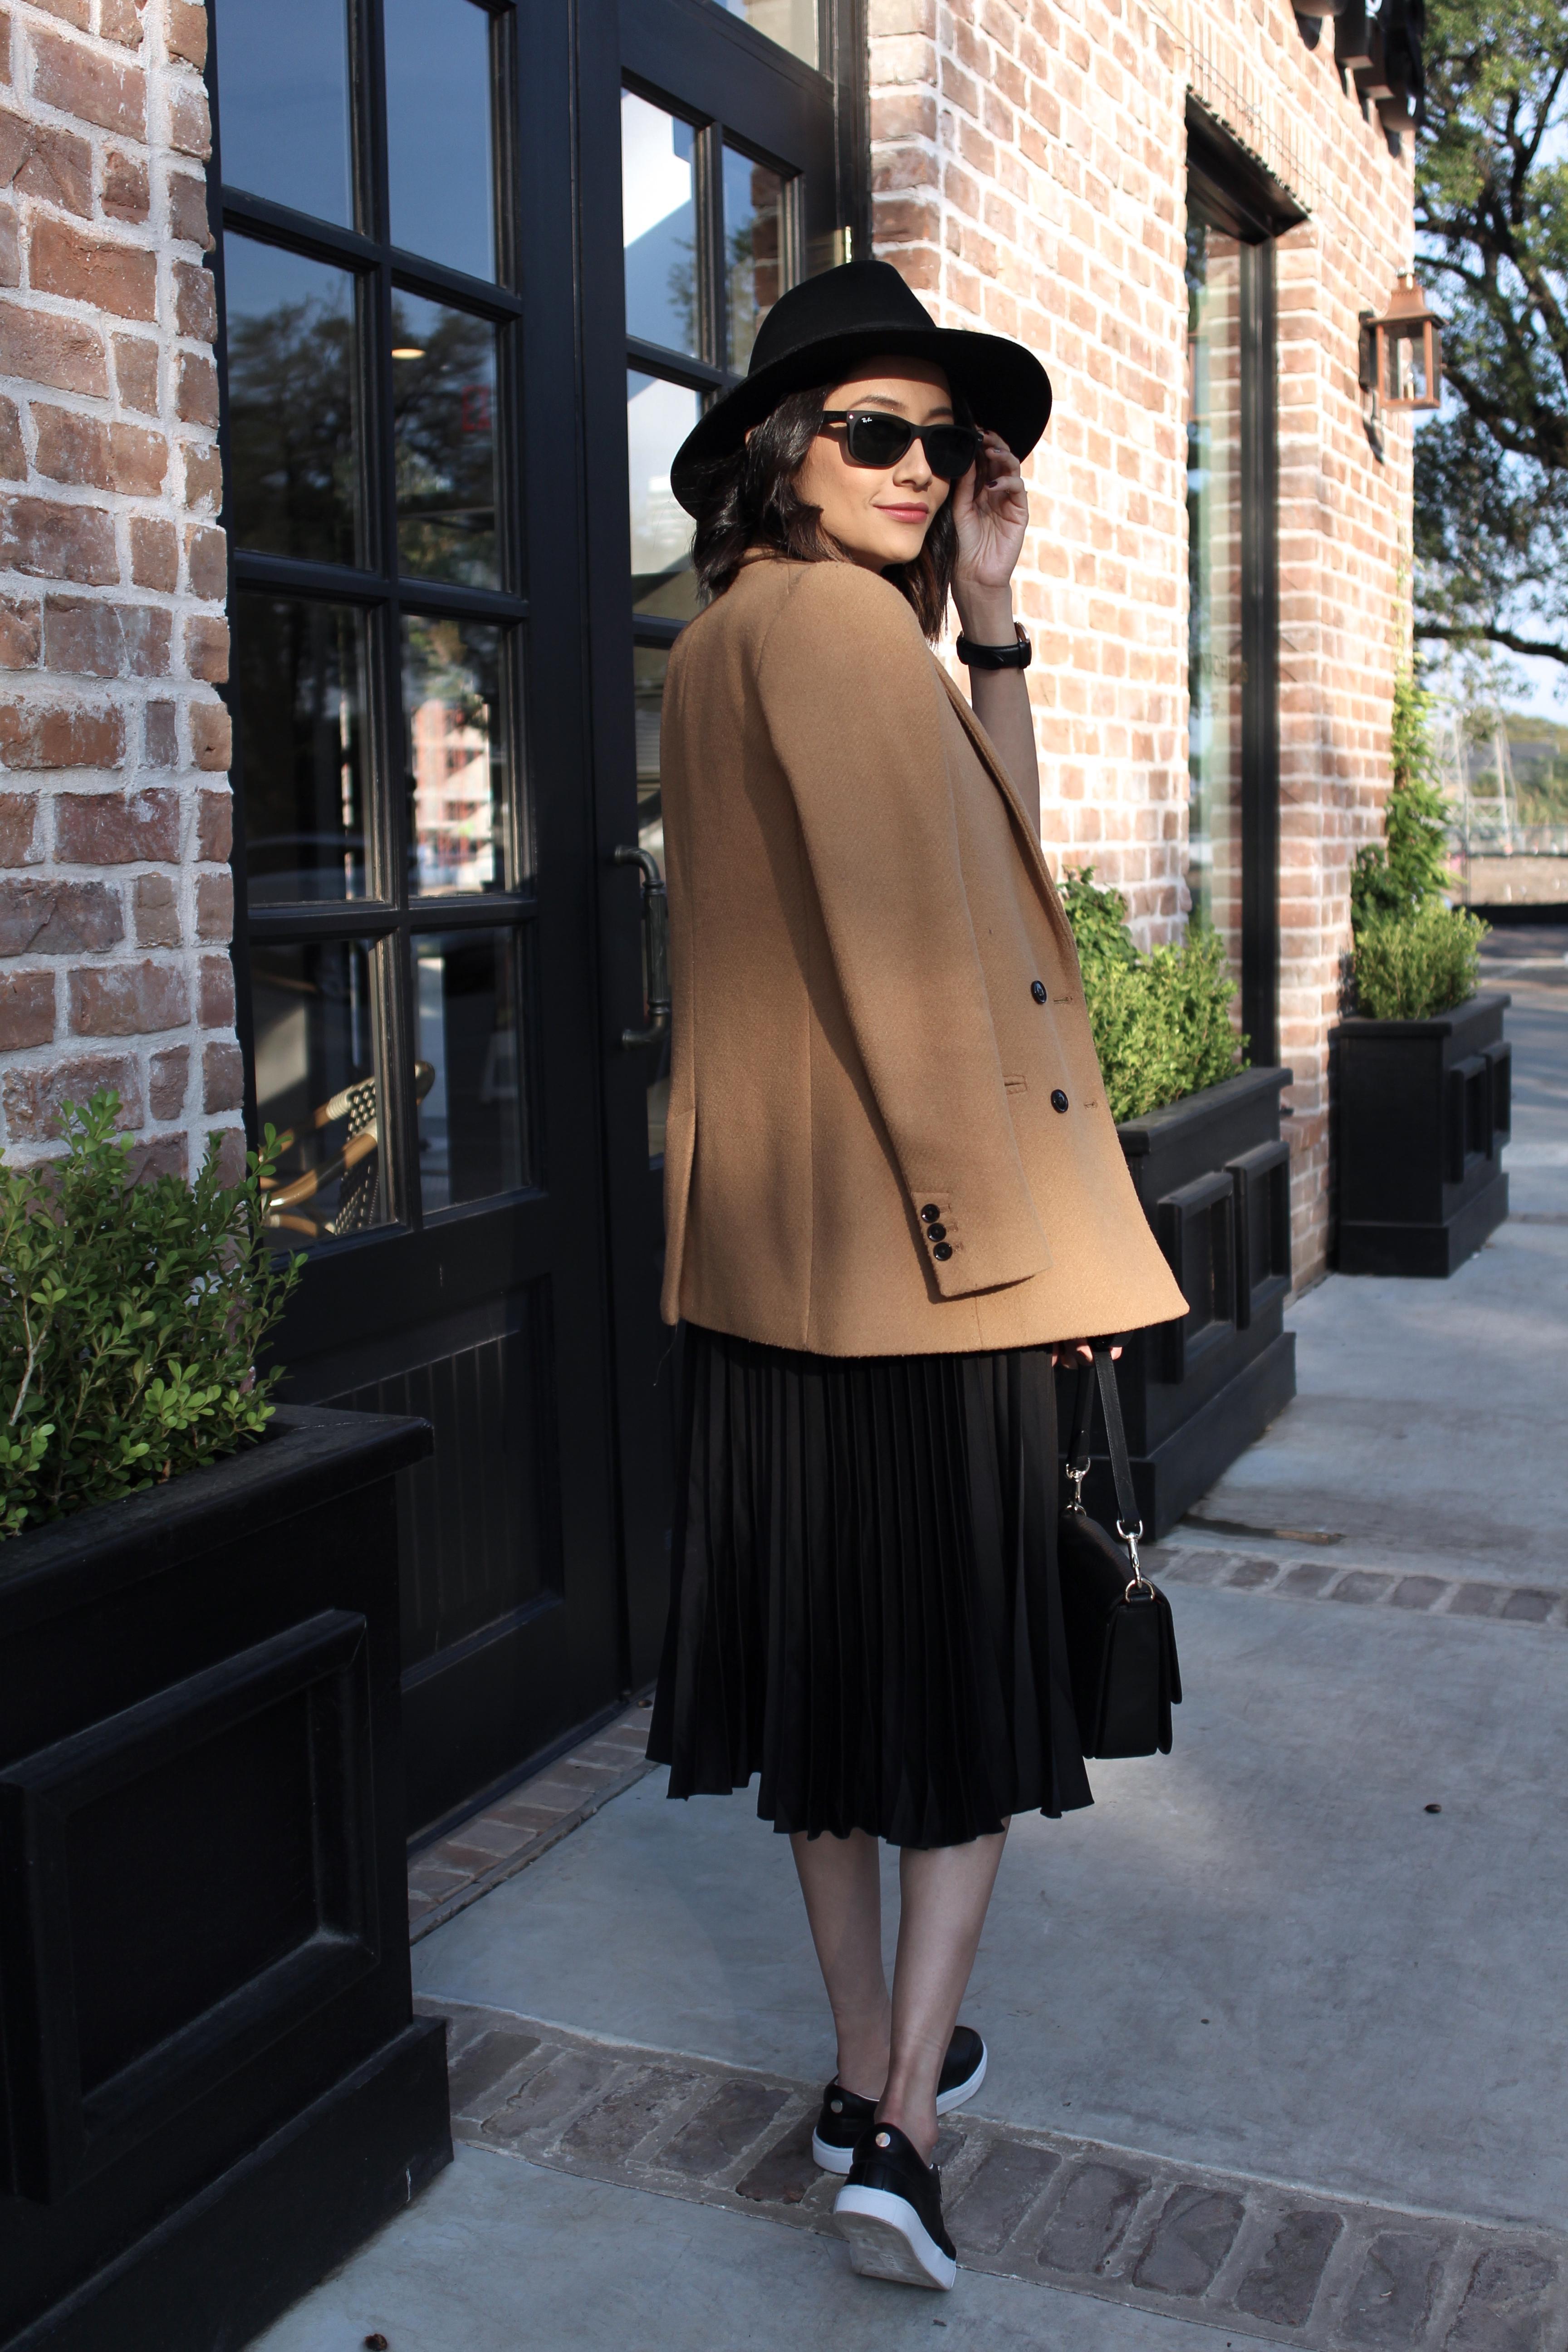 Fashion blogger off-duty look